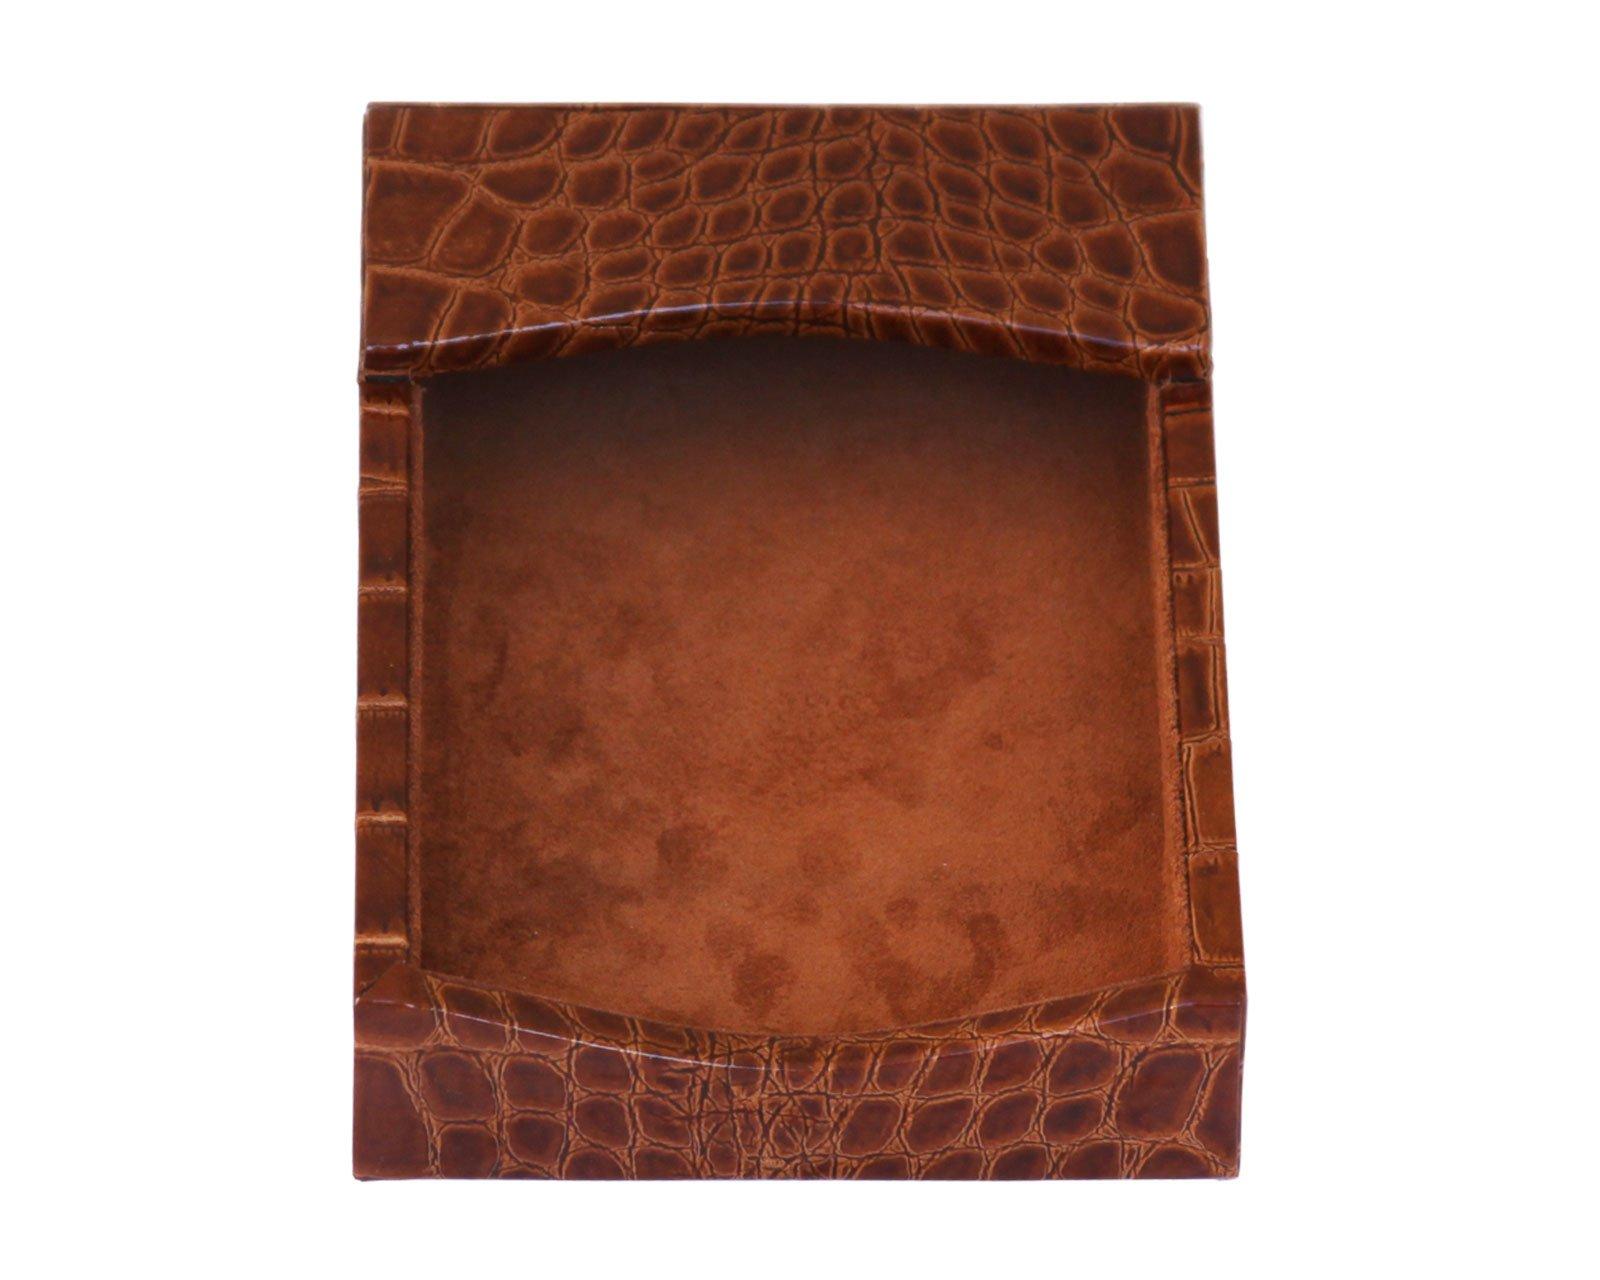 Dacasso Protacini Cognac Brown Italian Patent Leather 4'' x 6'' Memo Holder